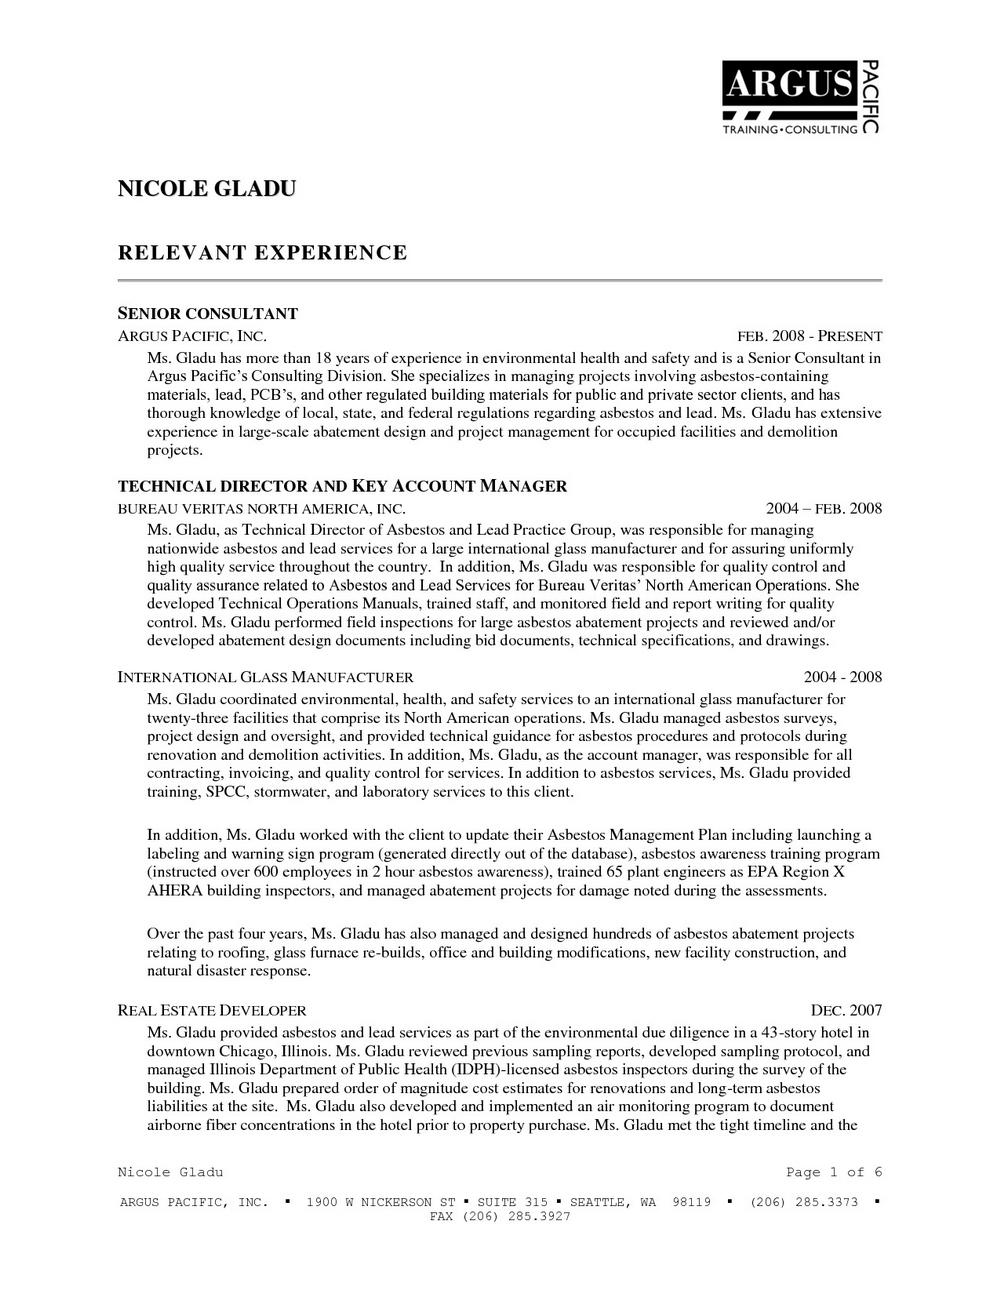 Building Maintenance Technician Resume Examplesresume Writers Bay Area